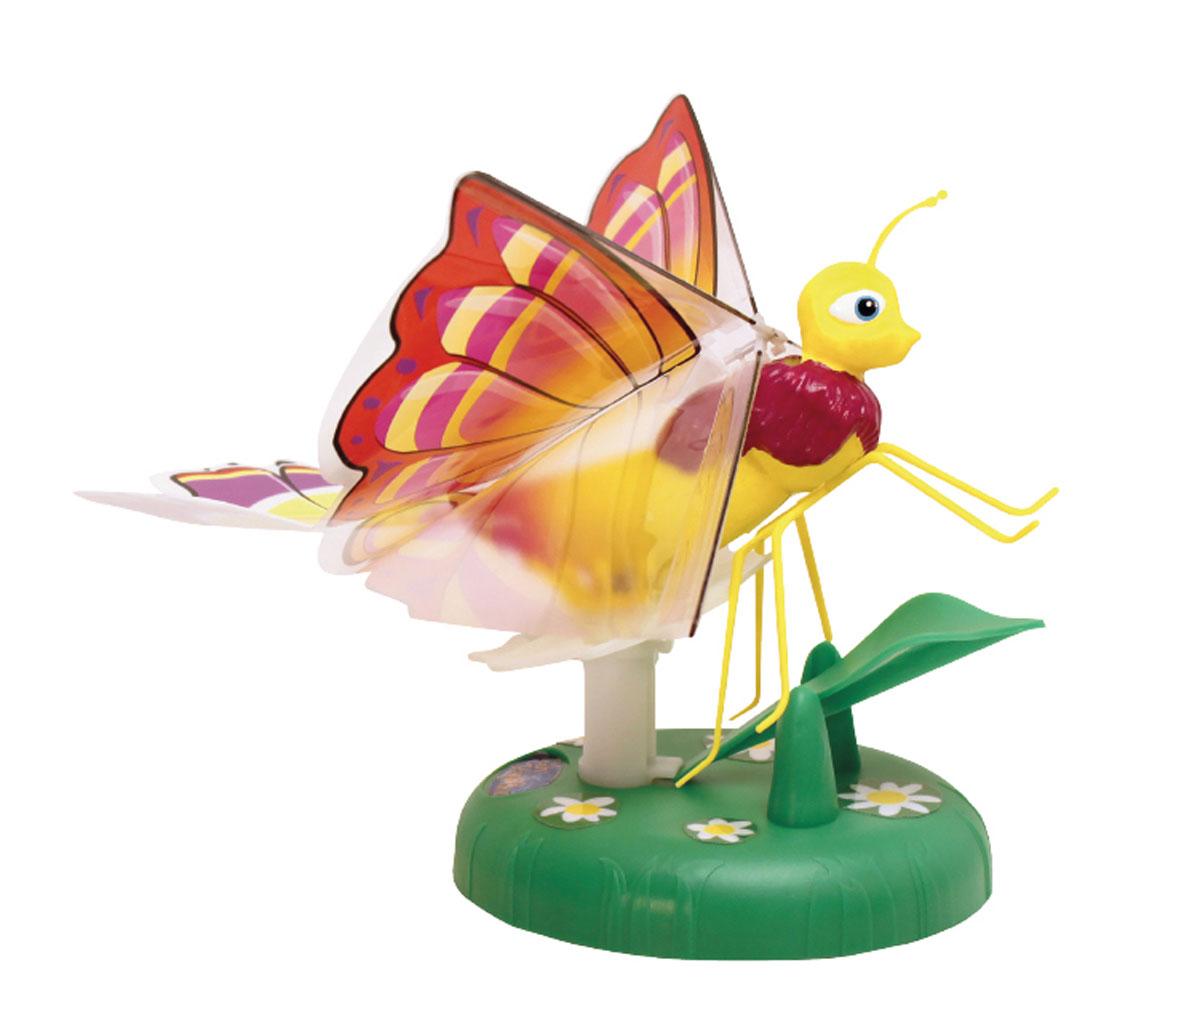 Splash Toys Интерактивная игрушка Летающая бабочка цвет желтый игрушка летающая мишень hovertech targetfx hovertech